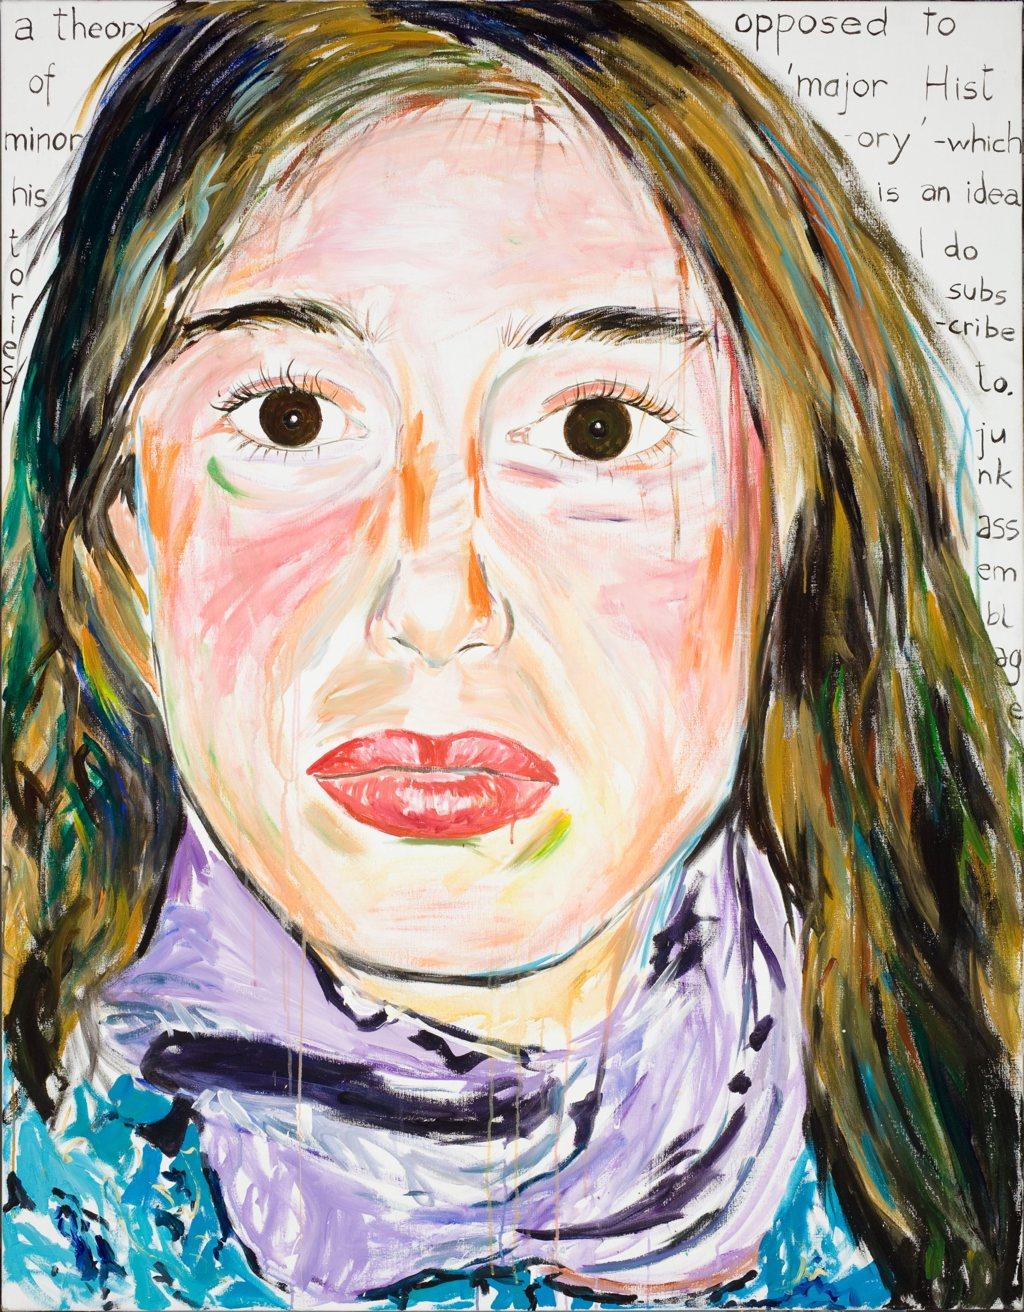 Private Self-Portrait or Artistic Staging?